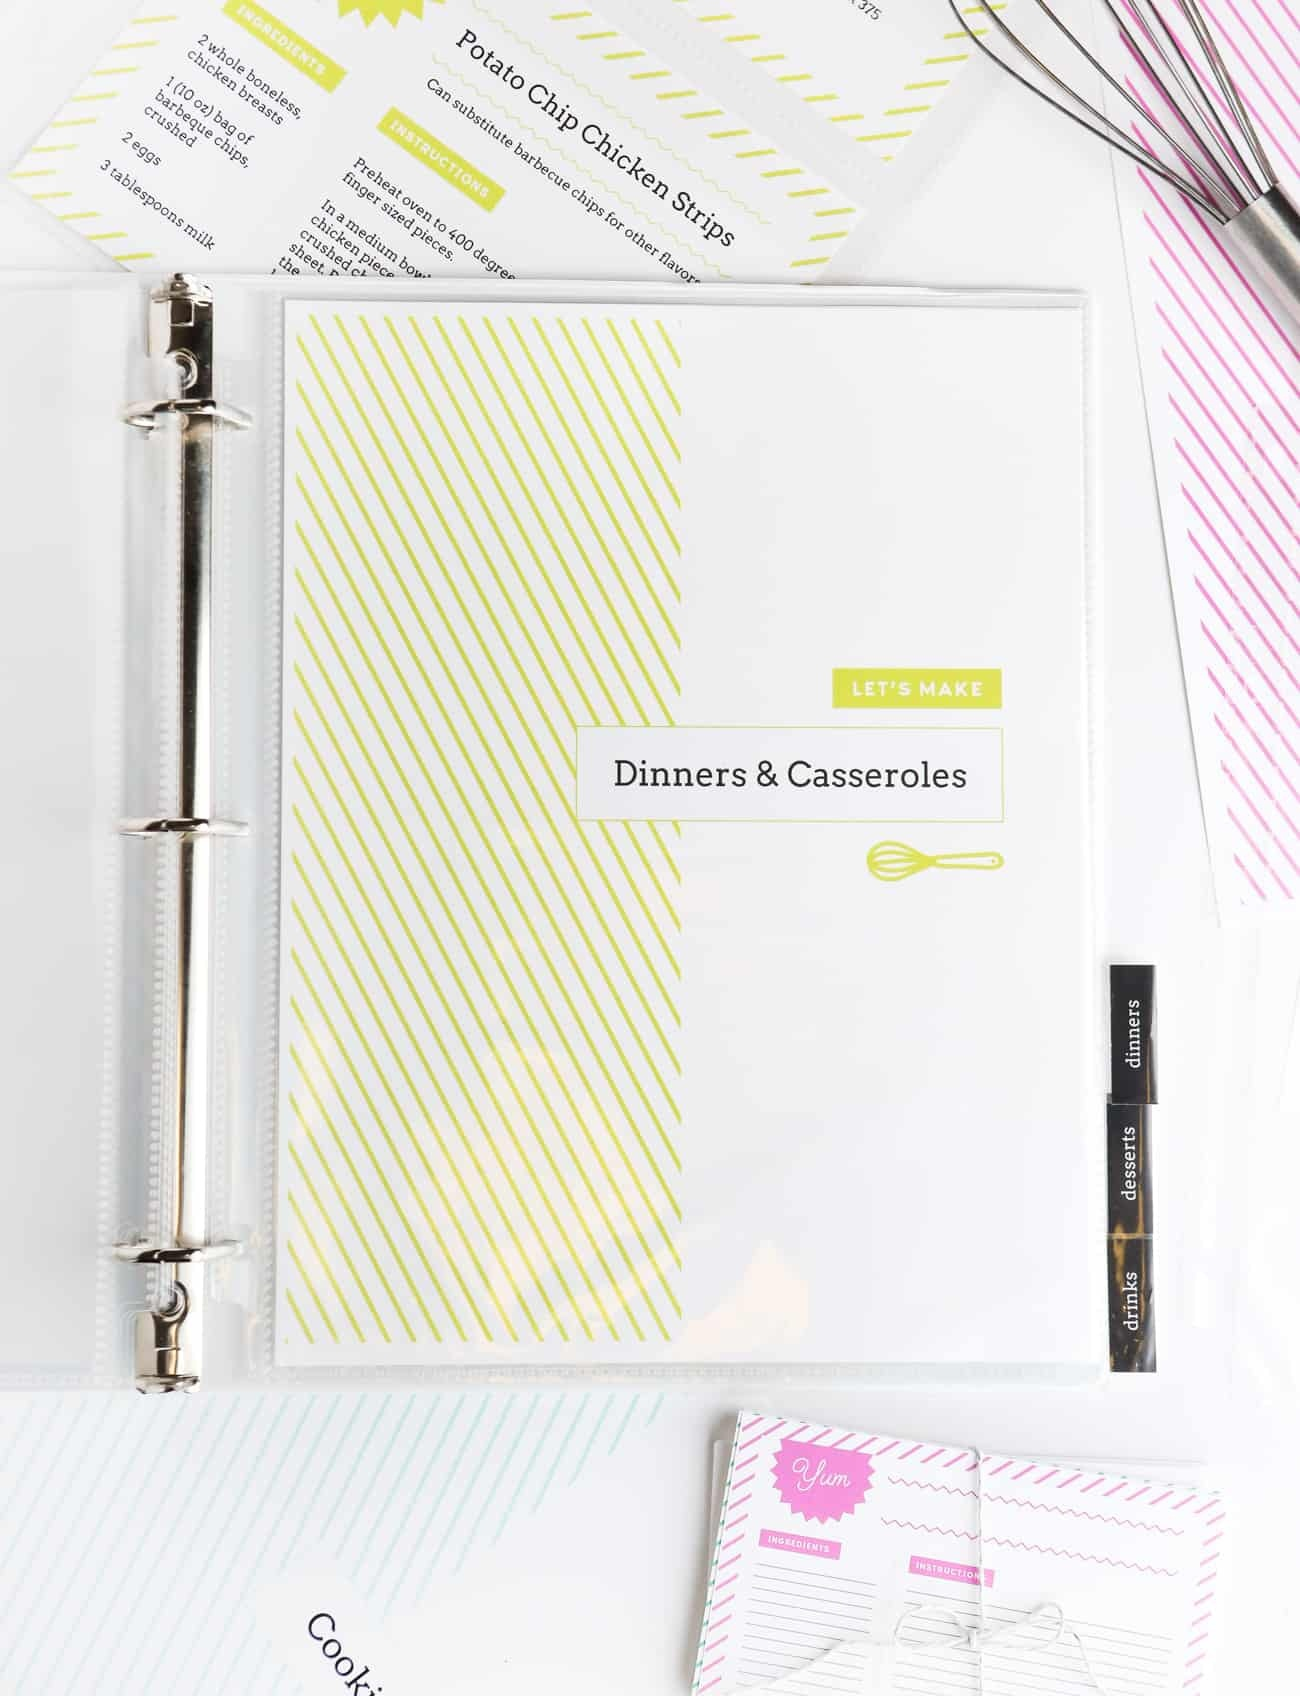 Diy Recipe Book (With Free Printable Recipe Binder Kit!) - Free Printable Recipe Dividers